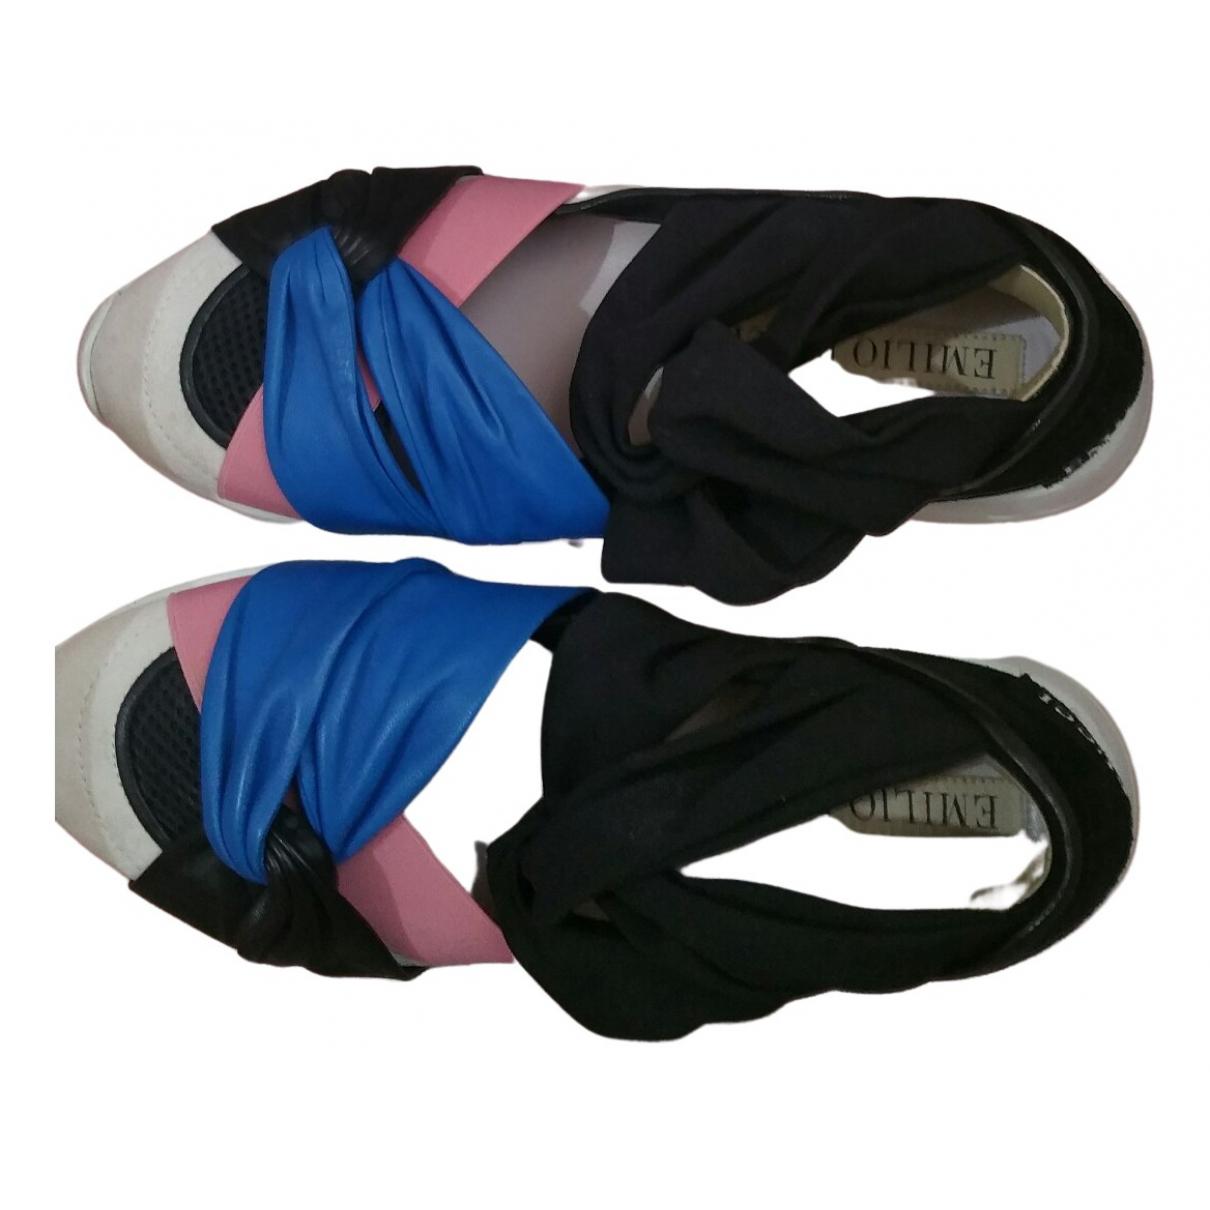 Emilio Pucci \N Sneakers in  Bunt Leder